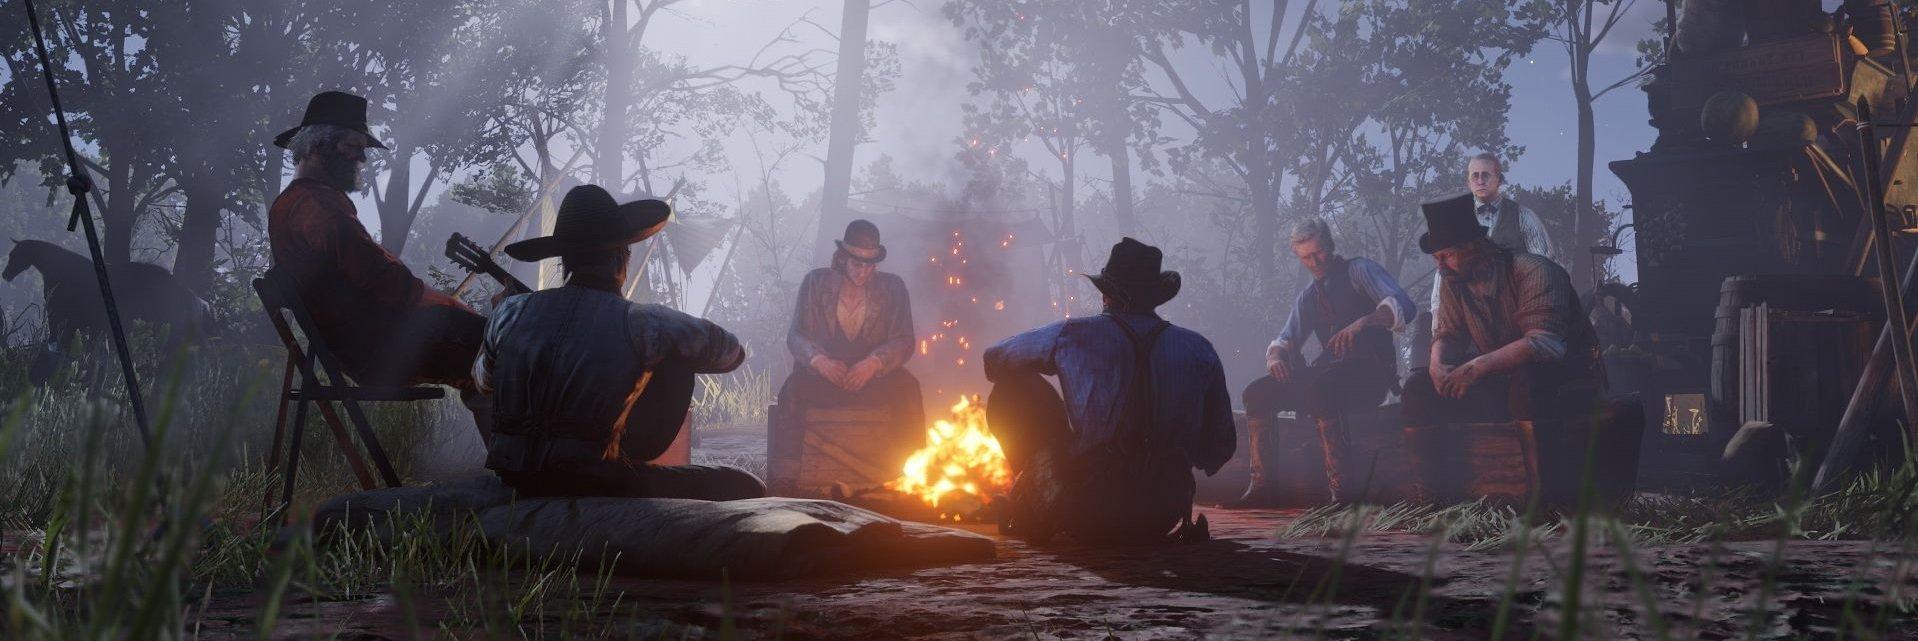 115749-Red-Dead-Redemption-2-make-camp-a